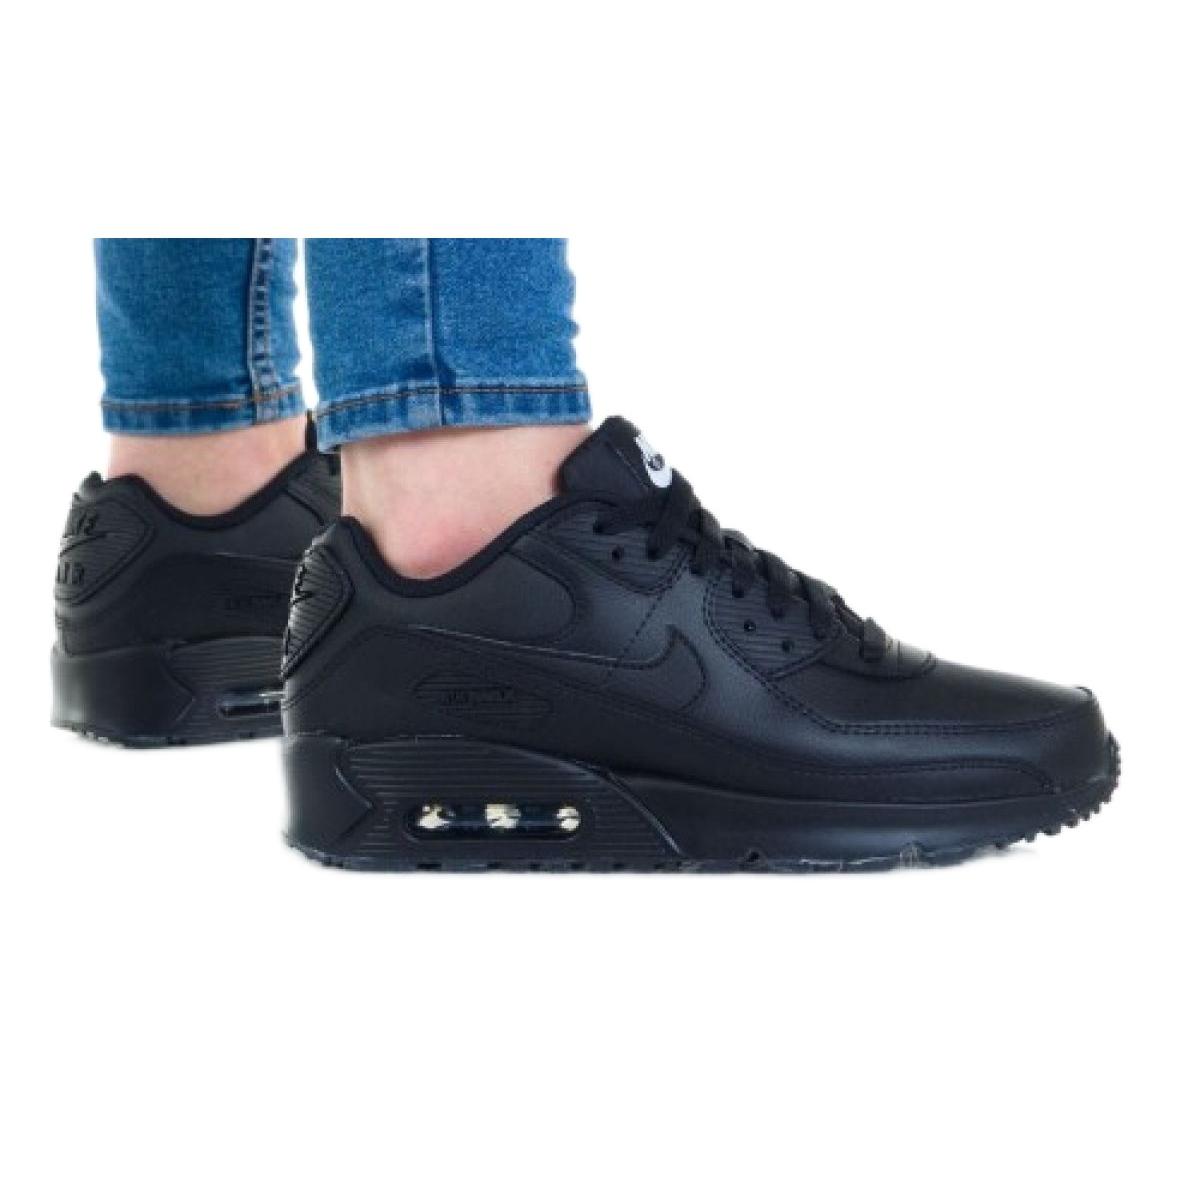 Nike Air Max 90 Ltr (GS) Jr CD6864-001 shoe white black